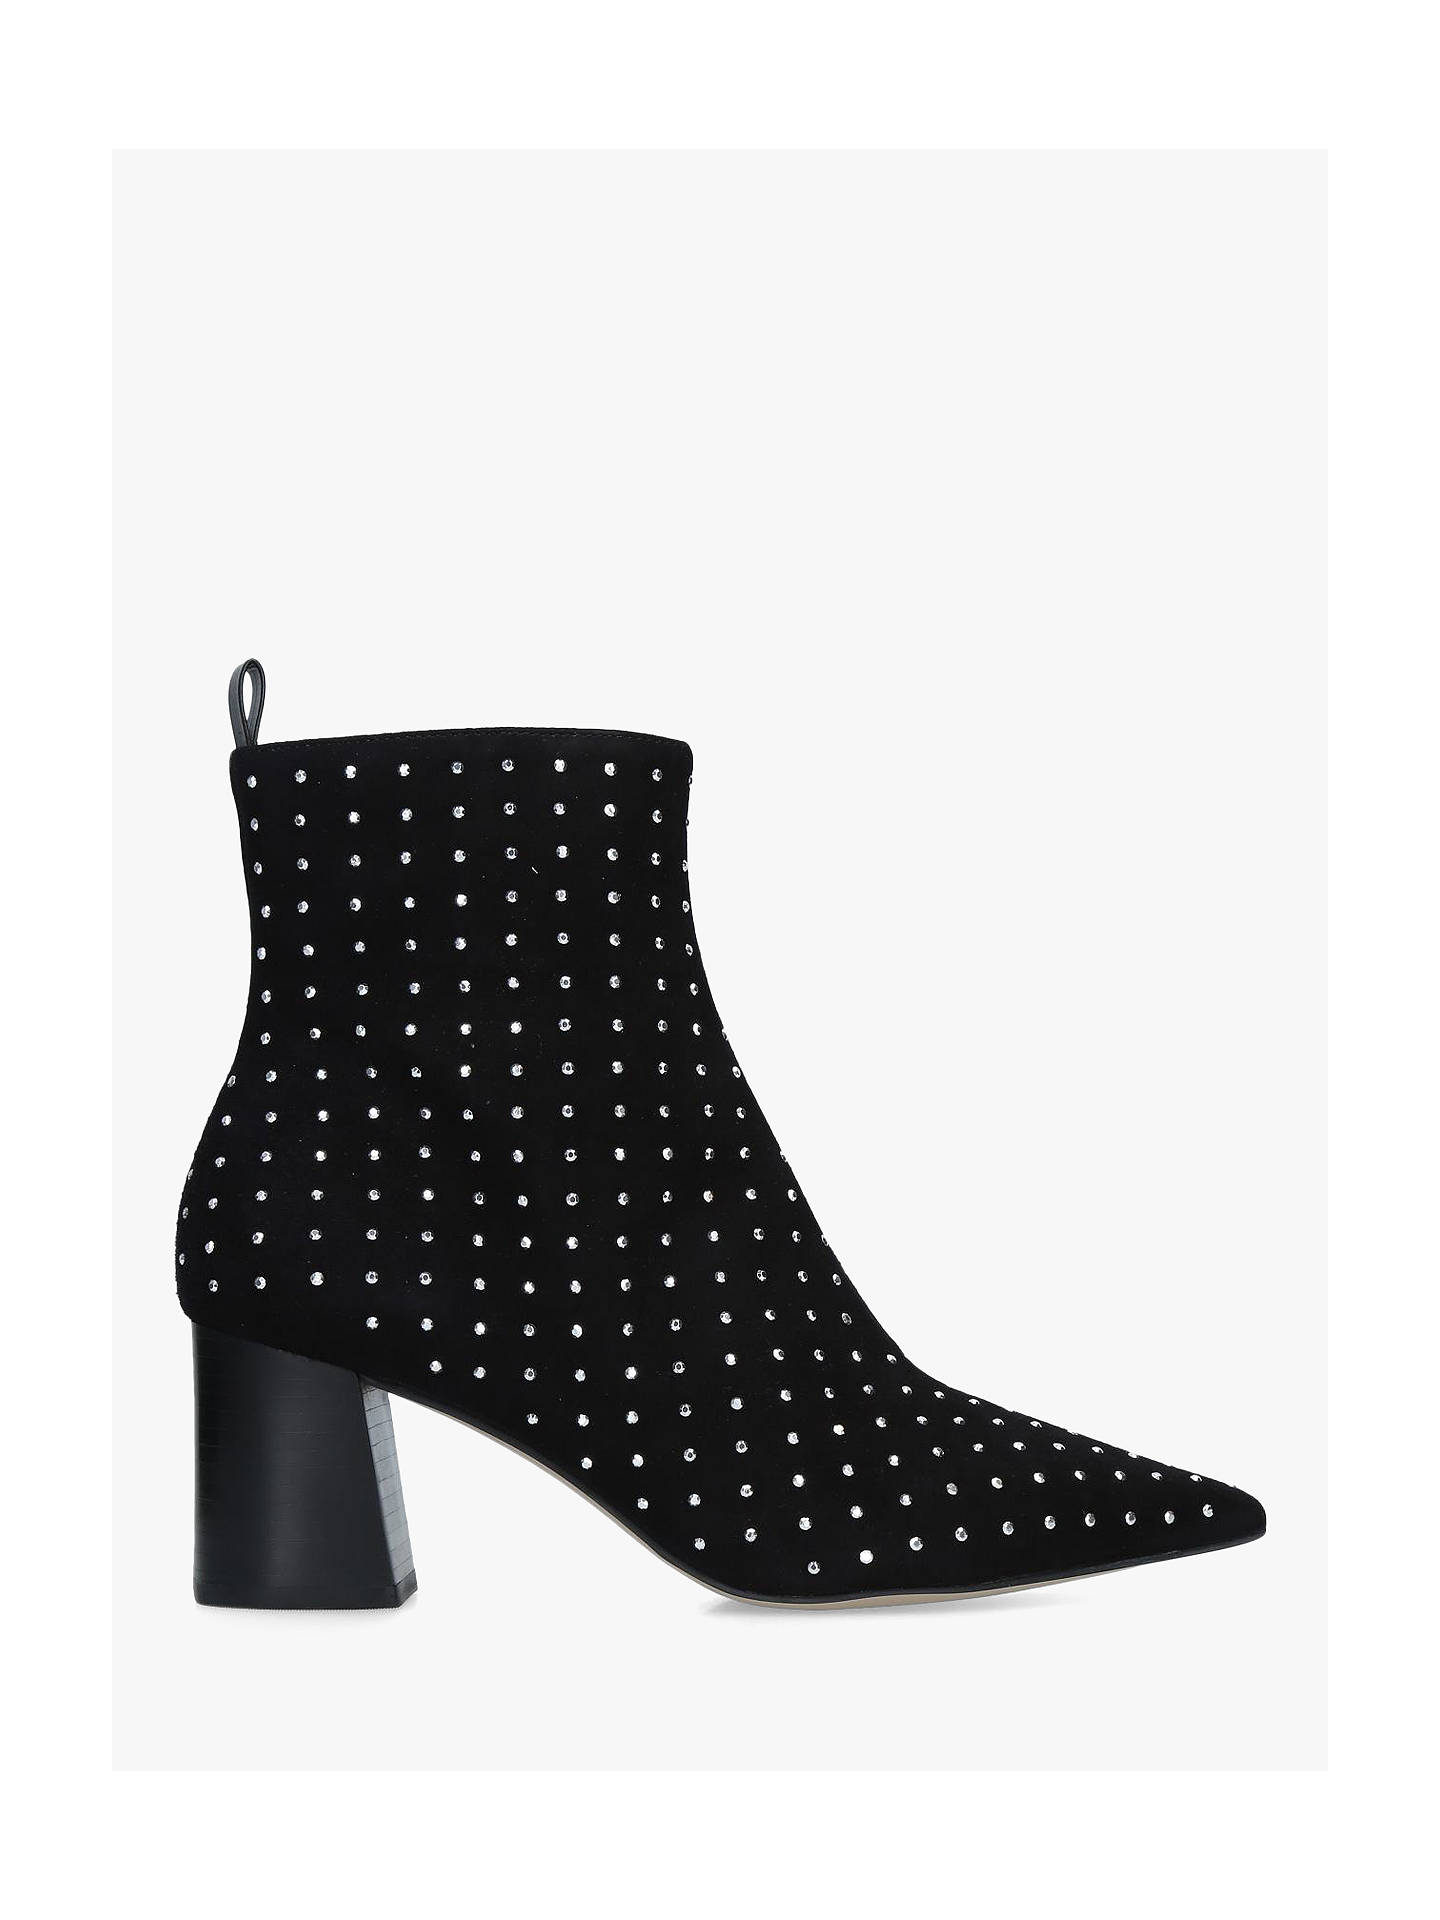 f9120439a8 Carvela Glitter Suede Block Heel Ankle Boots, Black at John Lewis ...